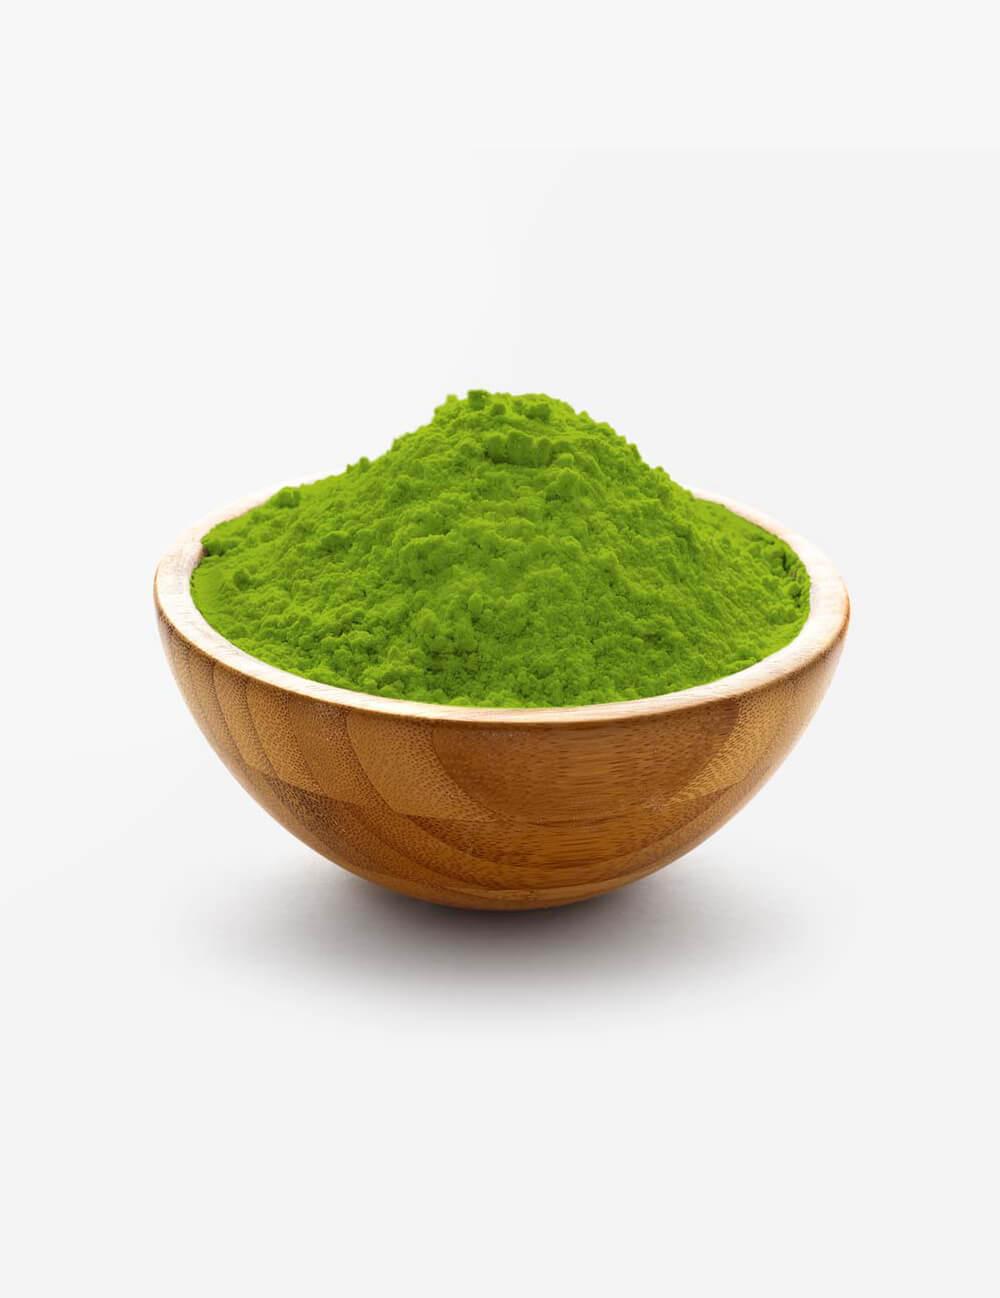 Green Tea Image 4